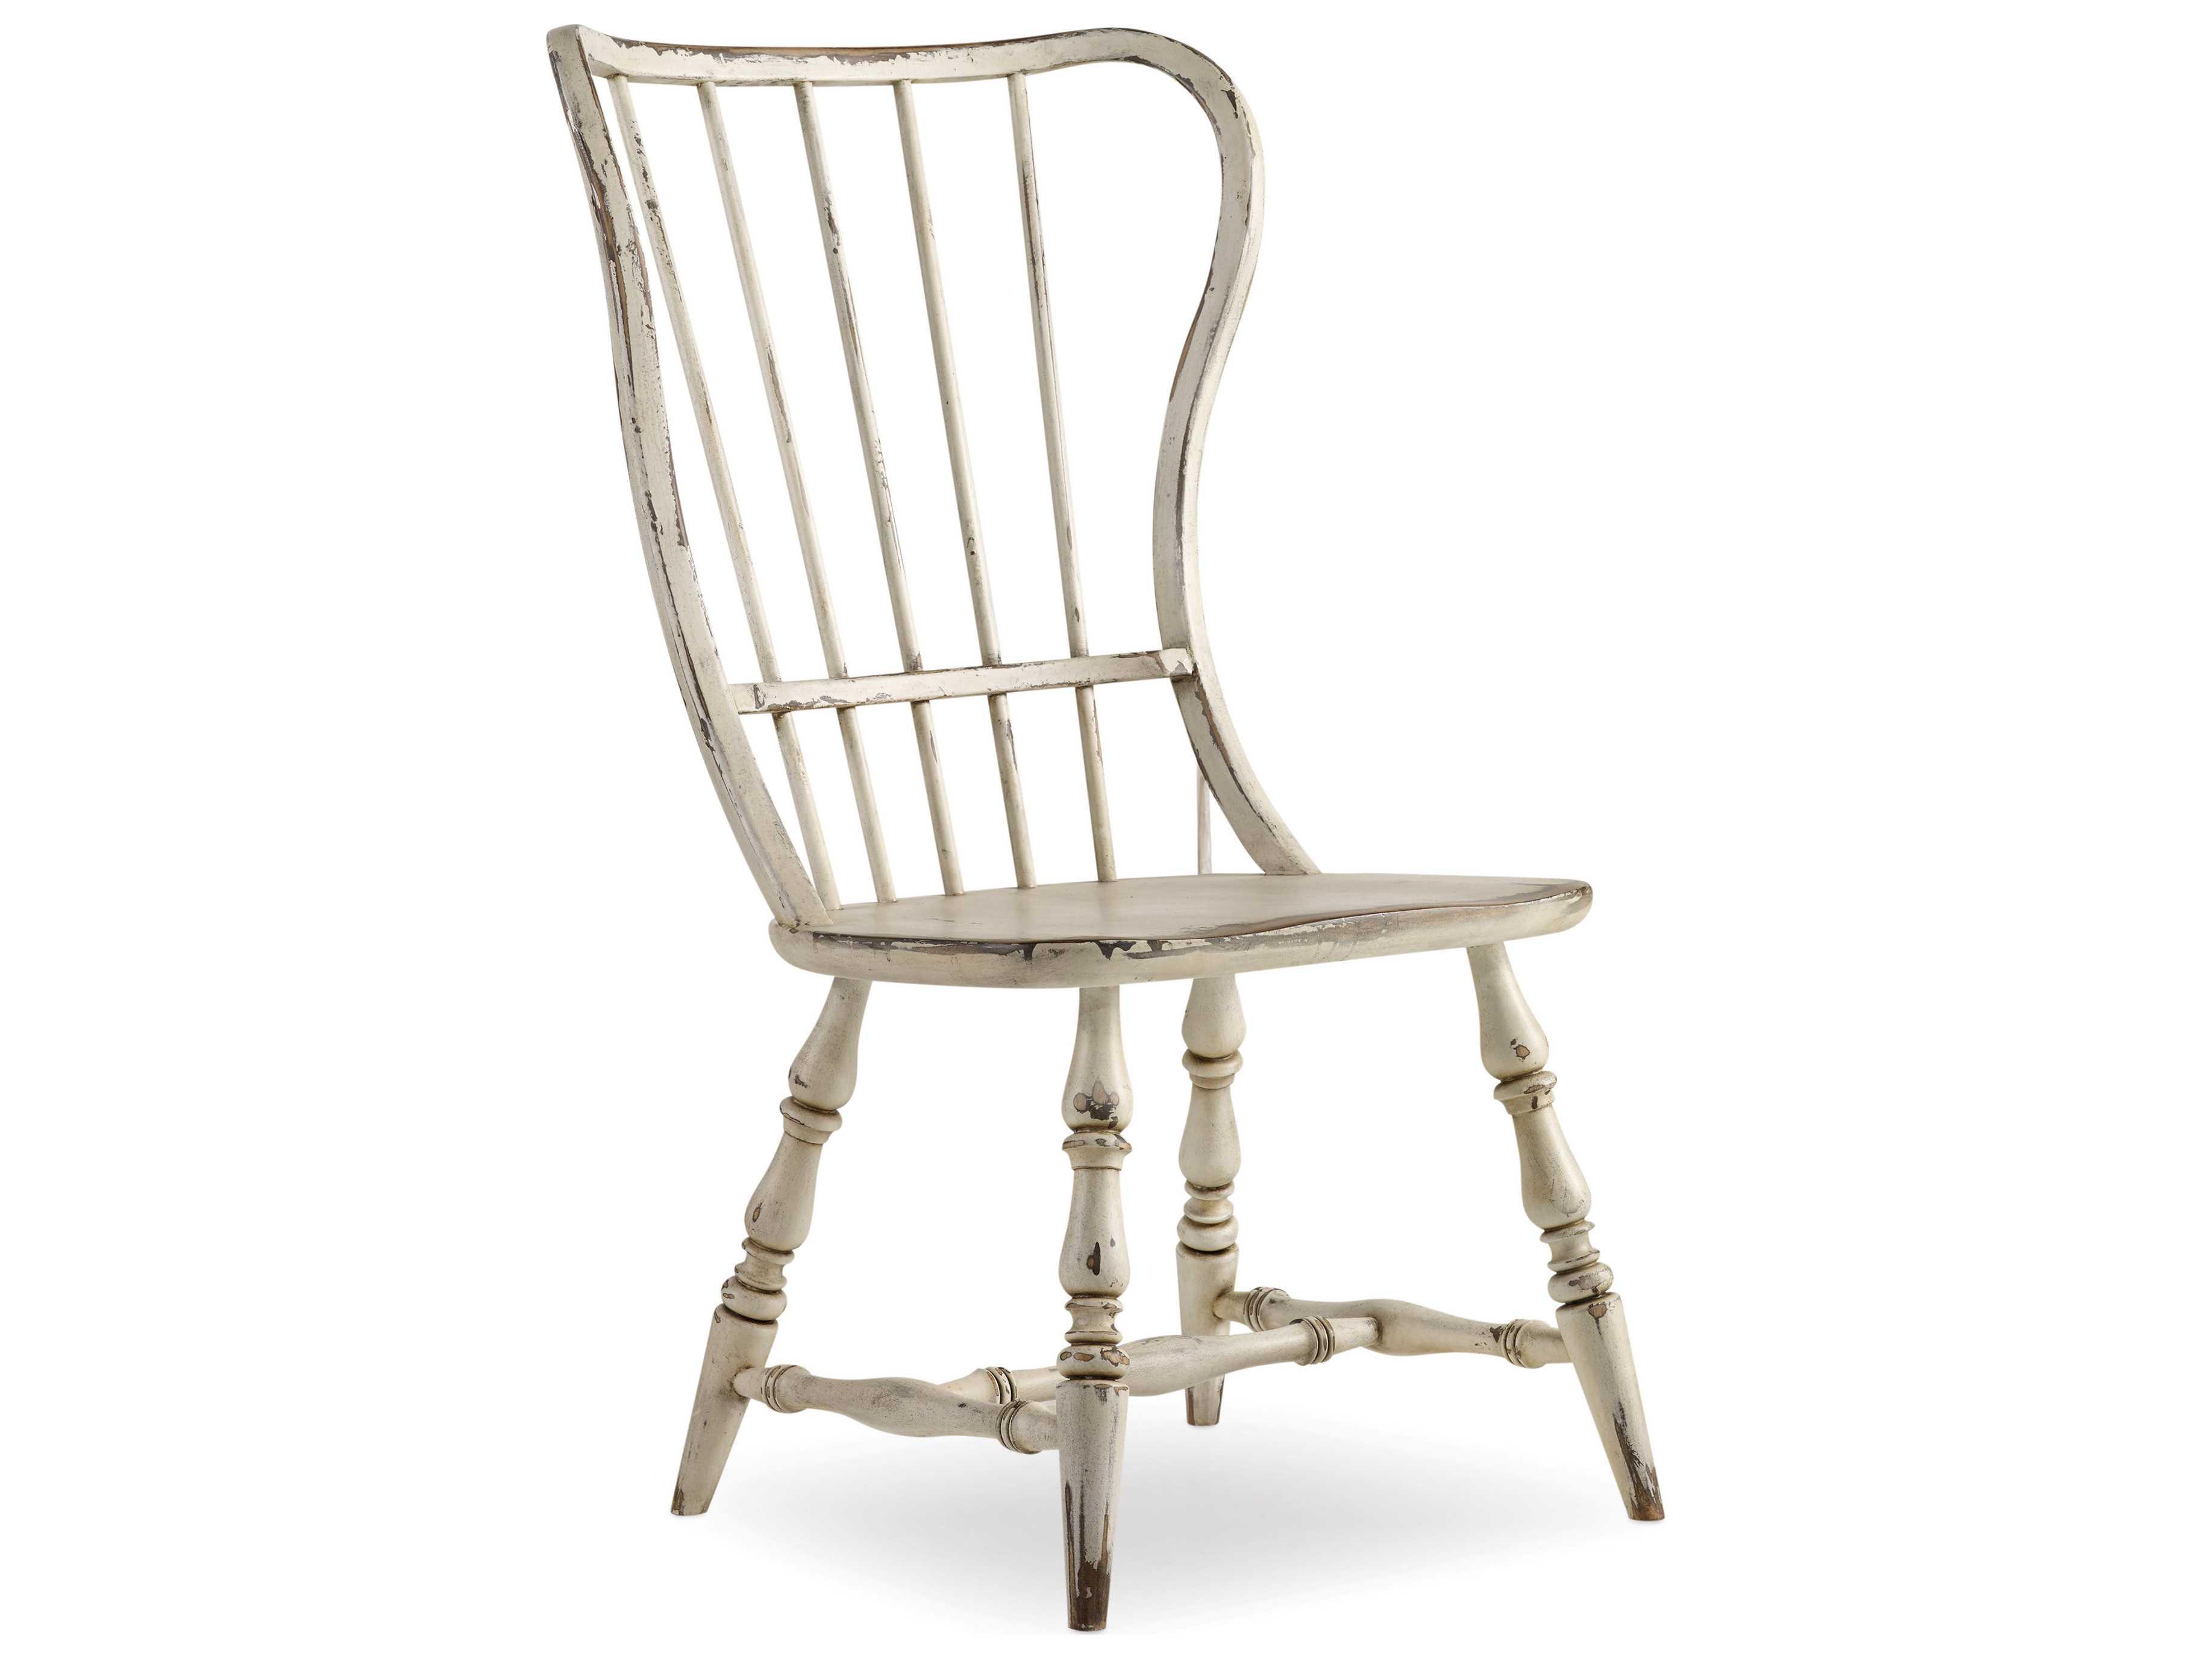 Hooker Furniture Sanctuary Vintage Chalky White Spindle